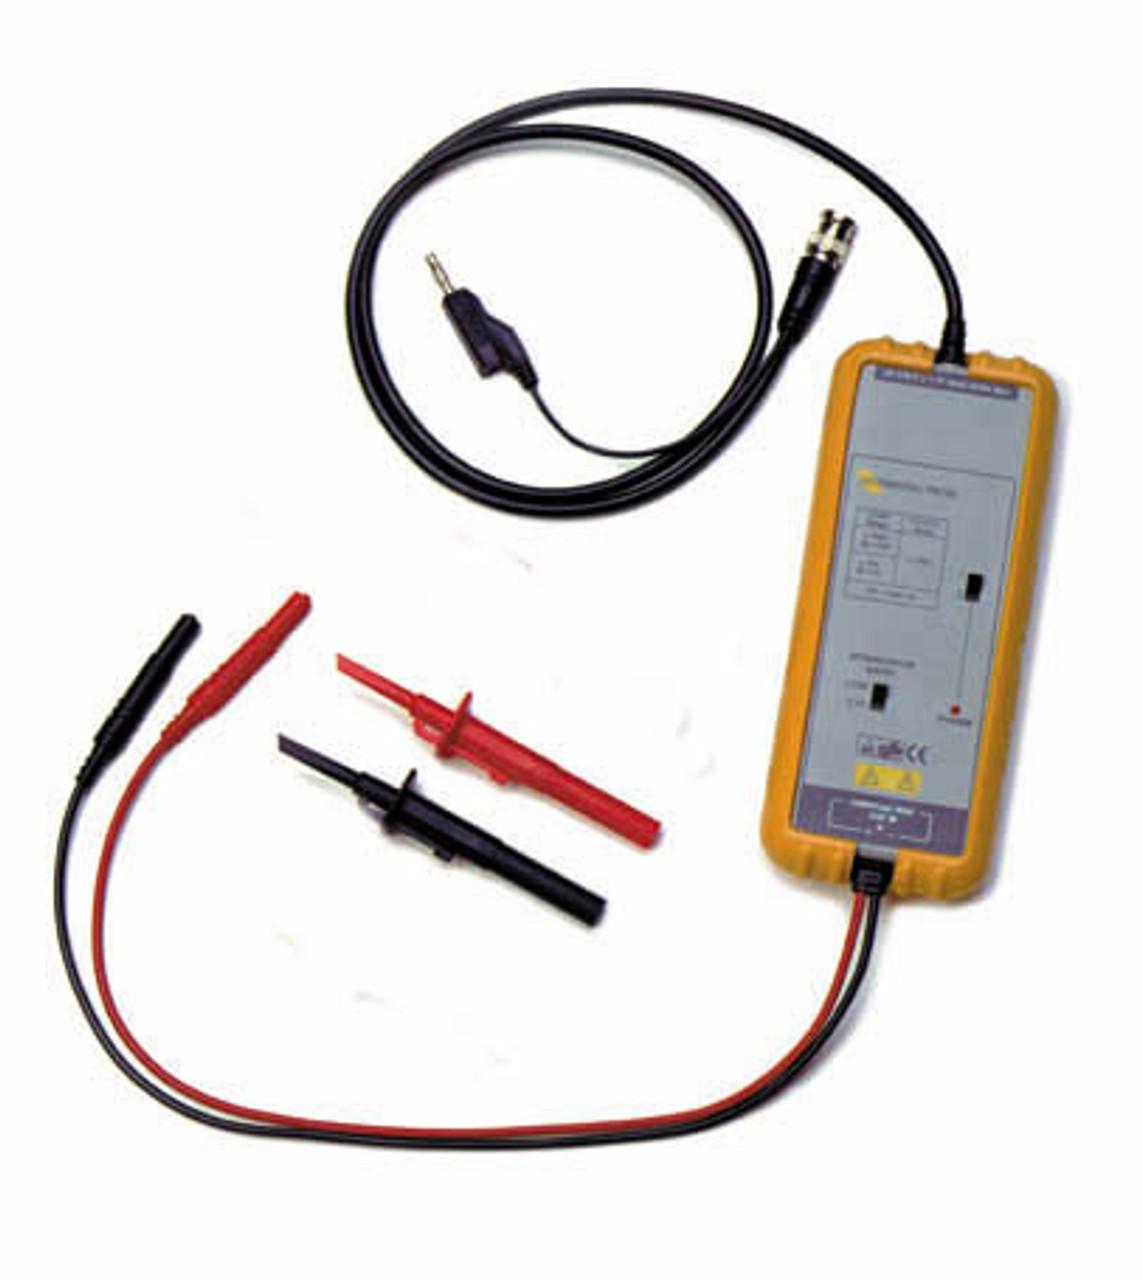 4231 Differential Probe 1:20/200, 25 MHz, 1400V